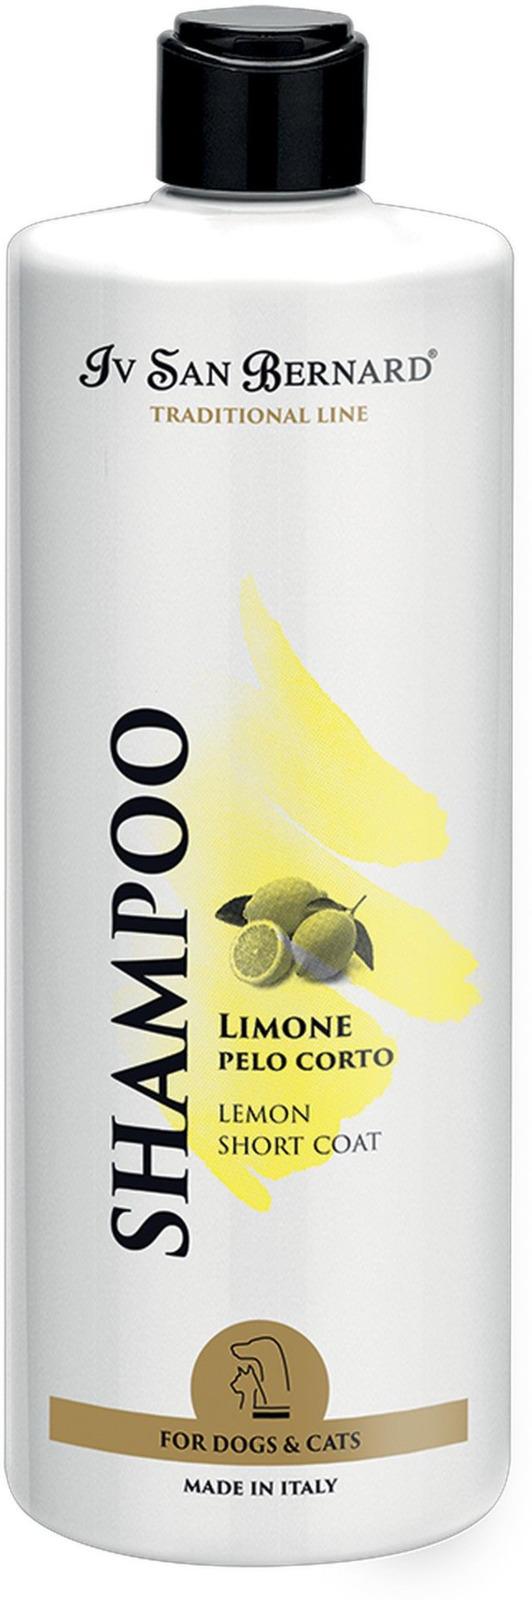 Шампунь для животных Iv San Bernard ISB Traditional Line Lemon, для короткой шерсти, 500 мл line шампунь